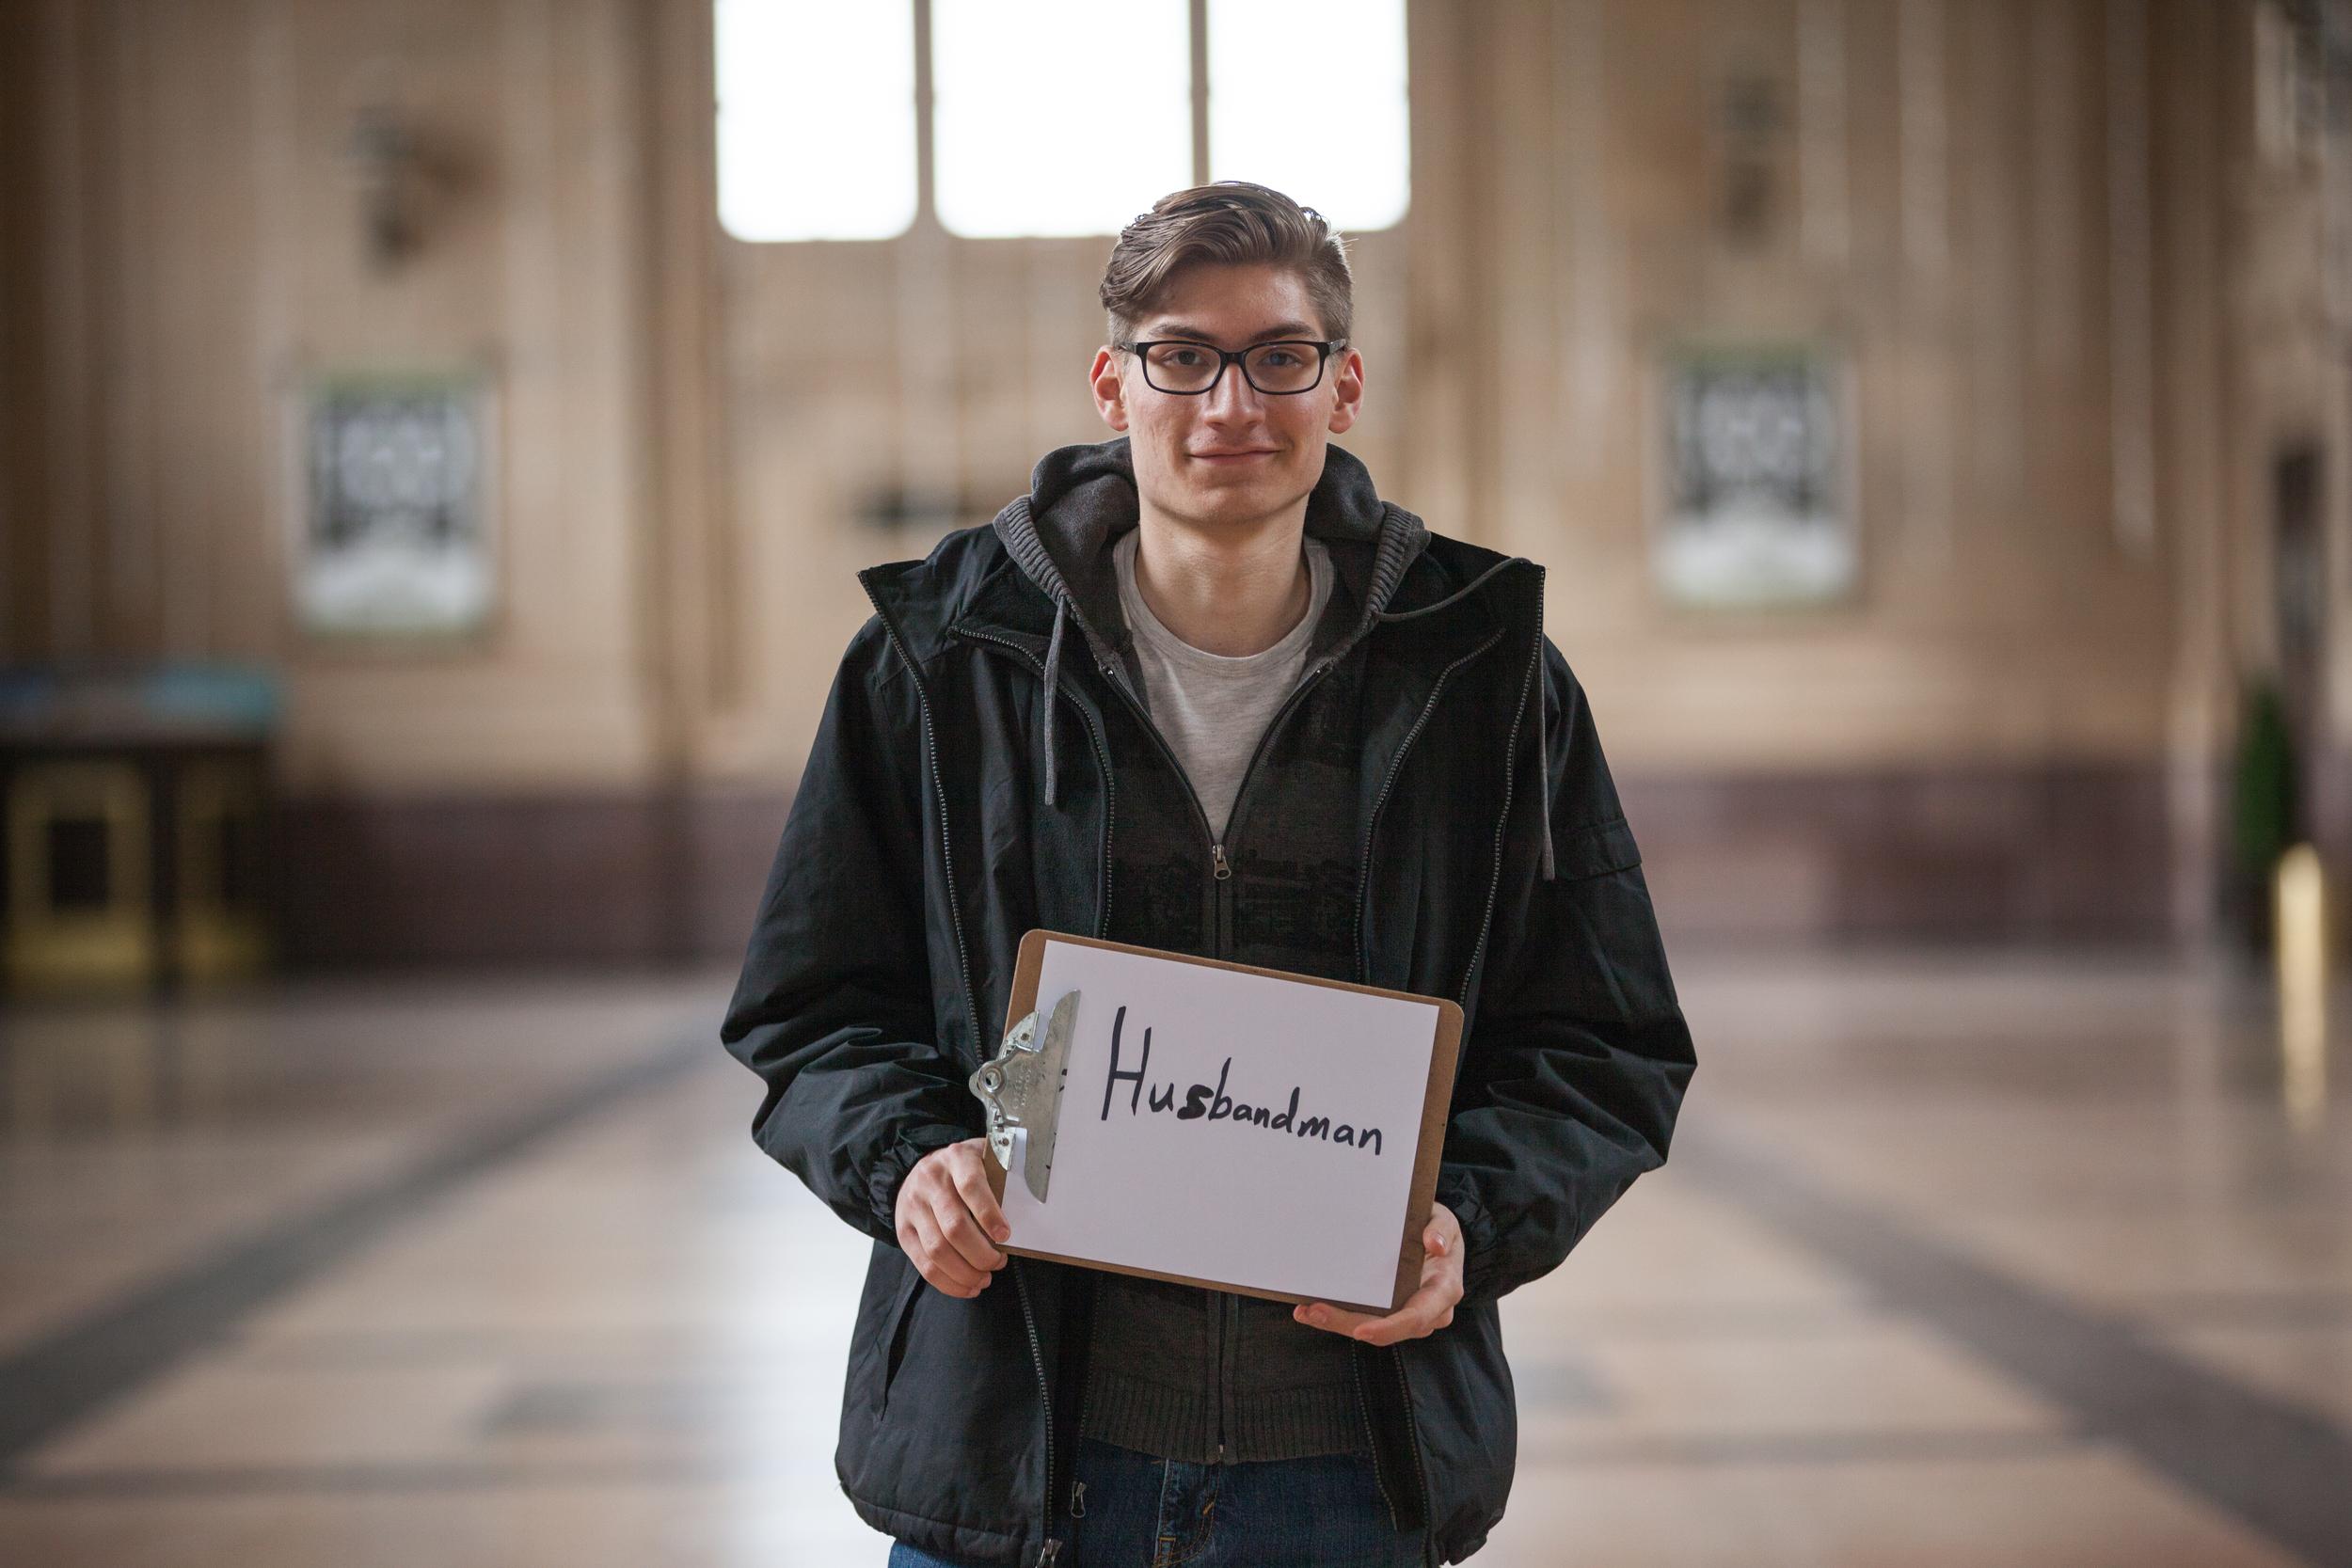 Young man holding a sign saying husbandmen.